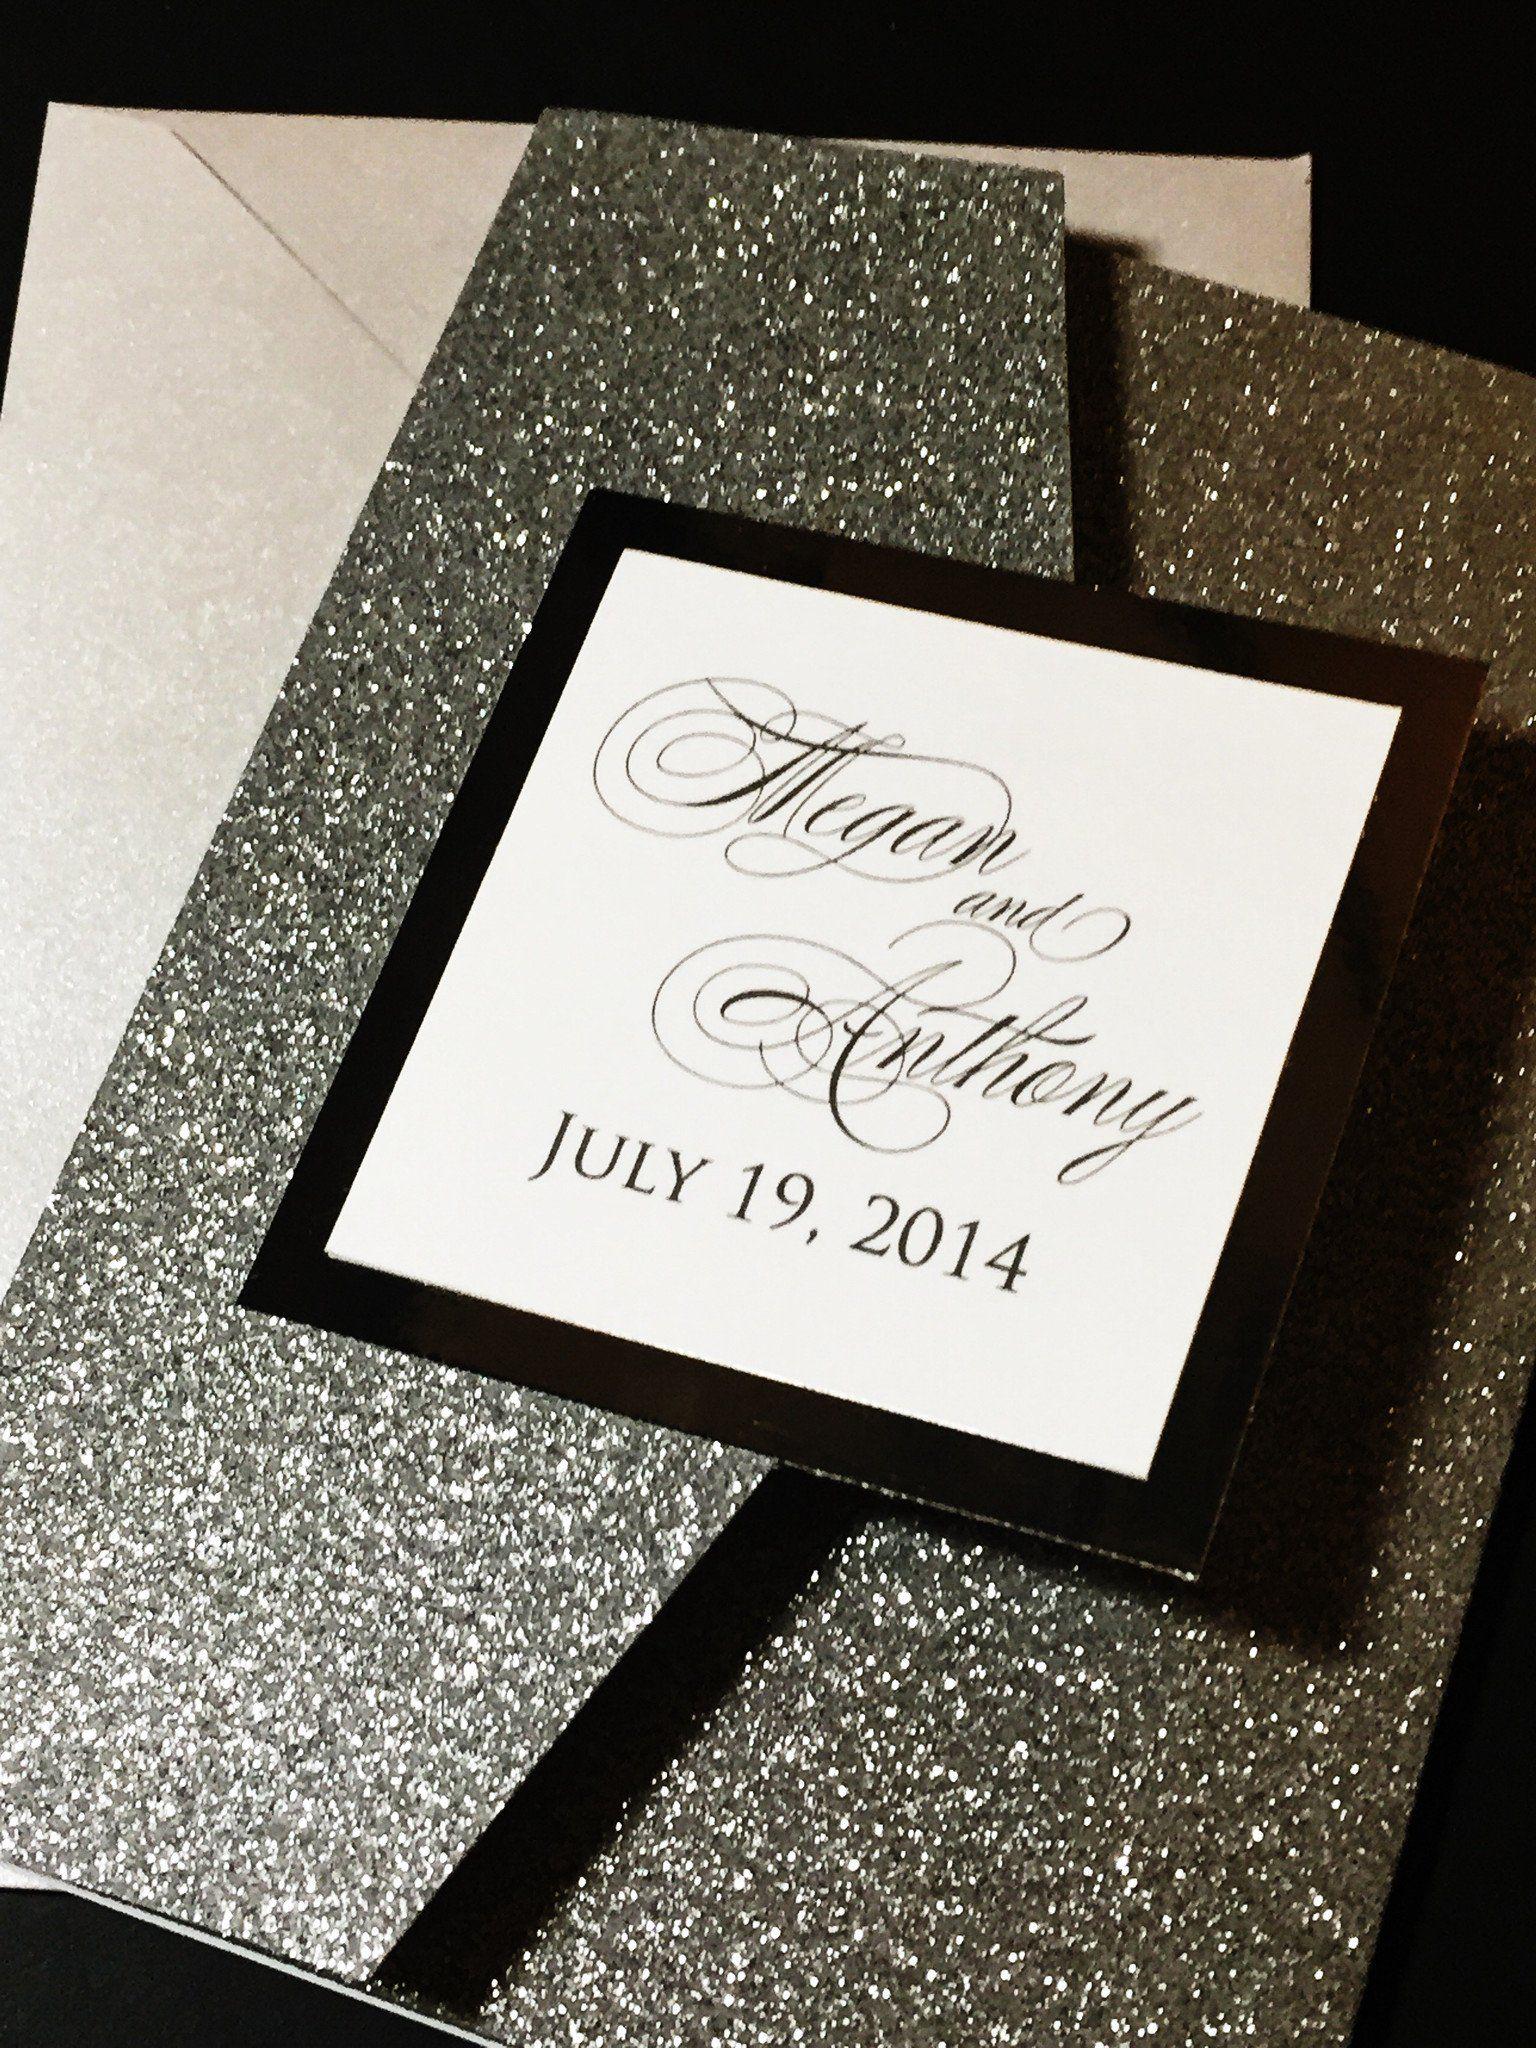 Glitter wedding invitations black tie wedding black